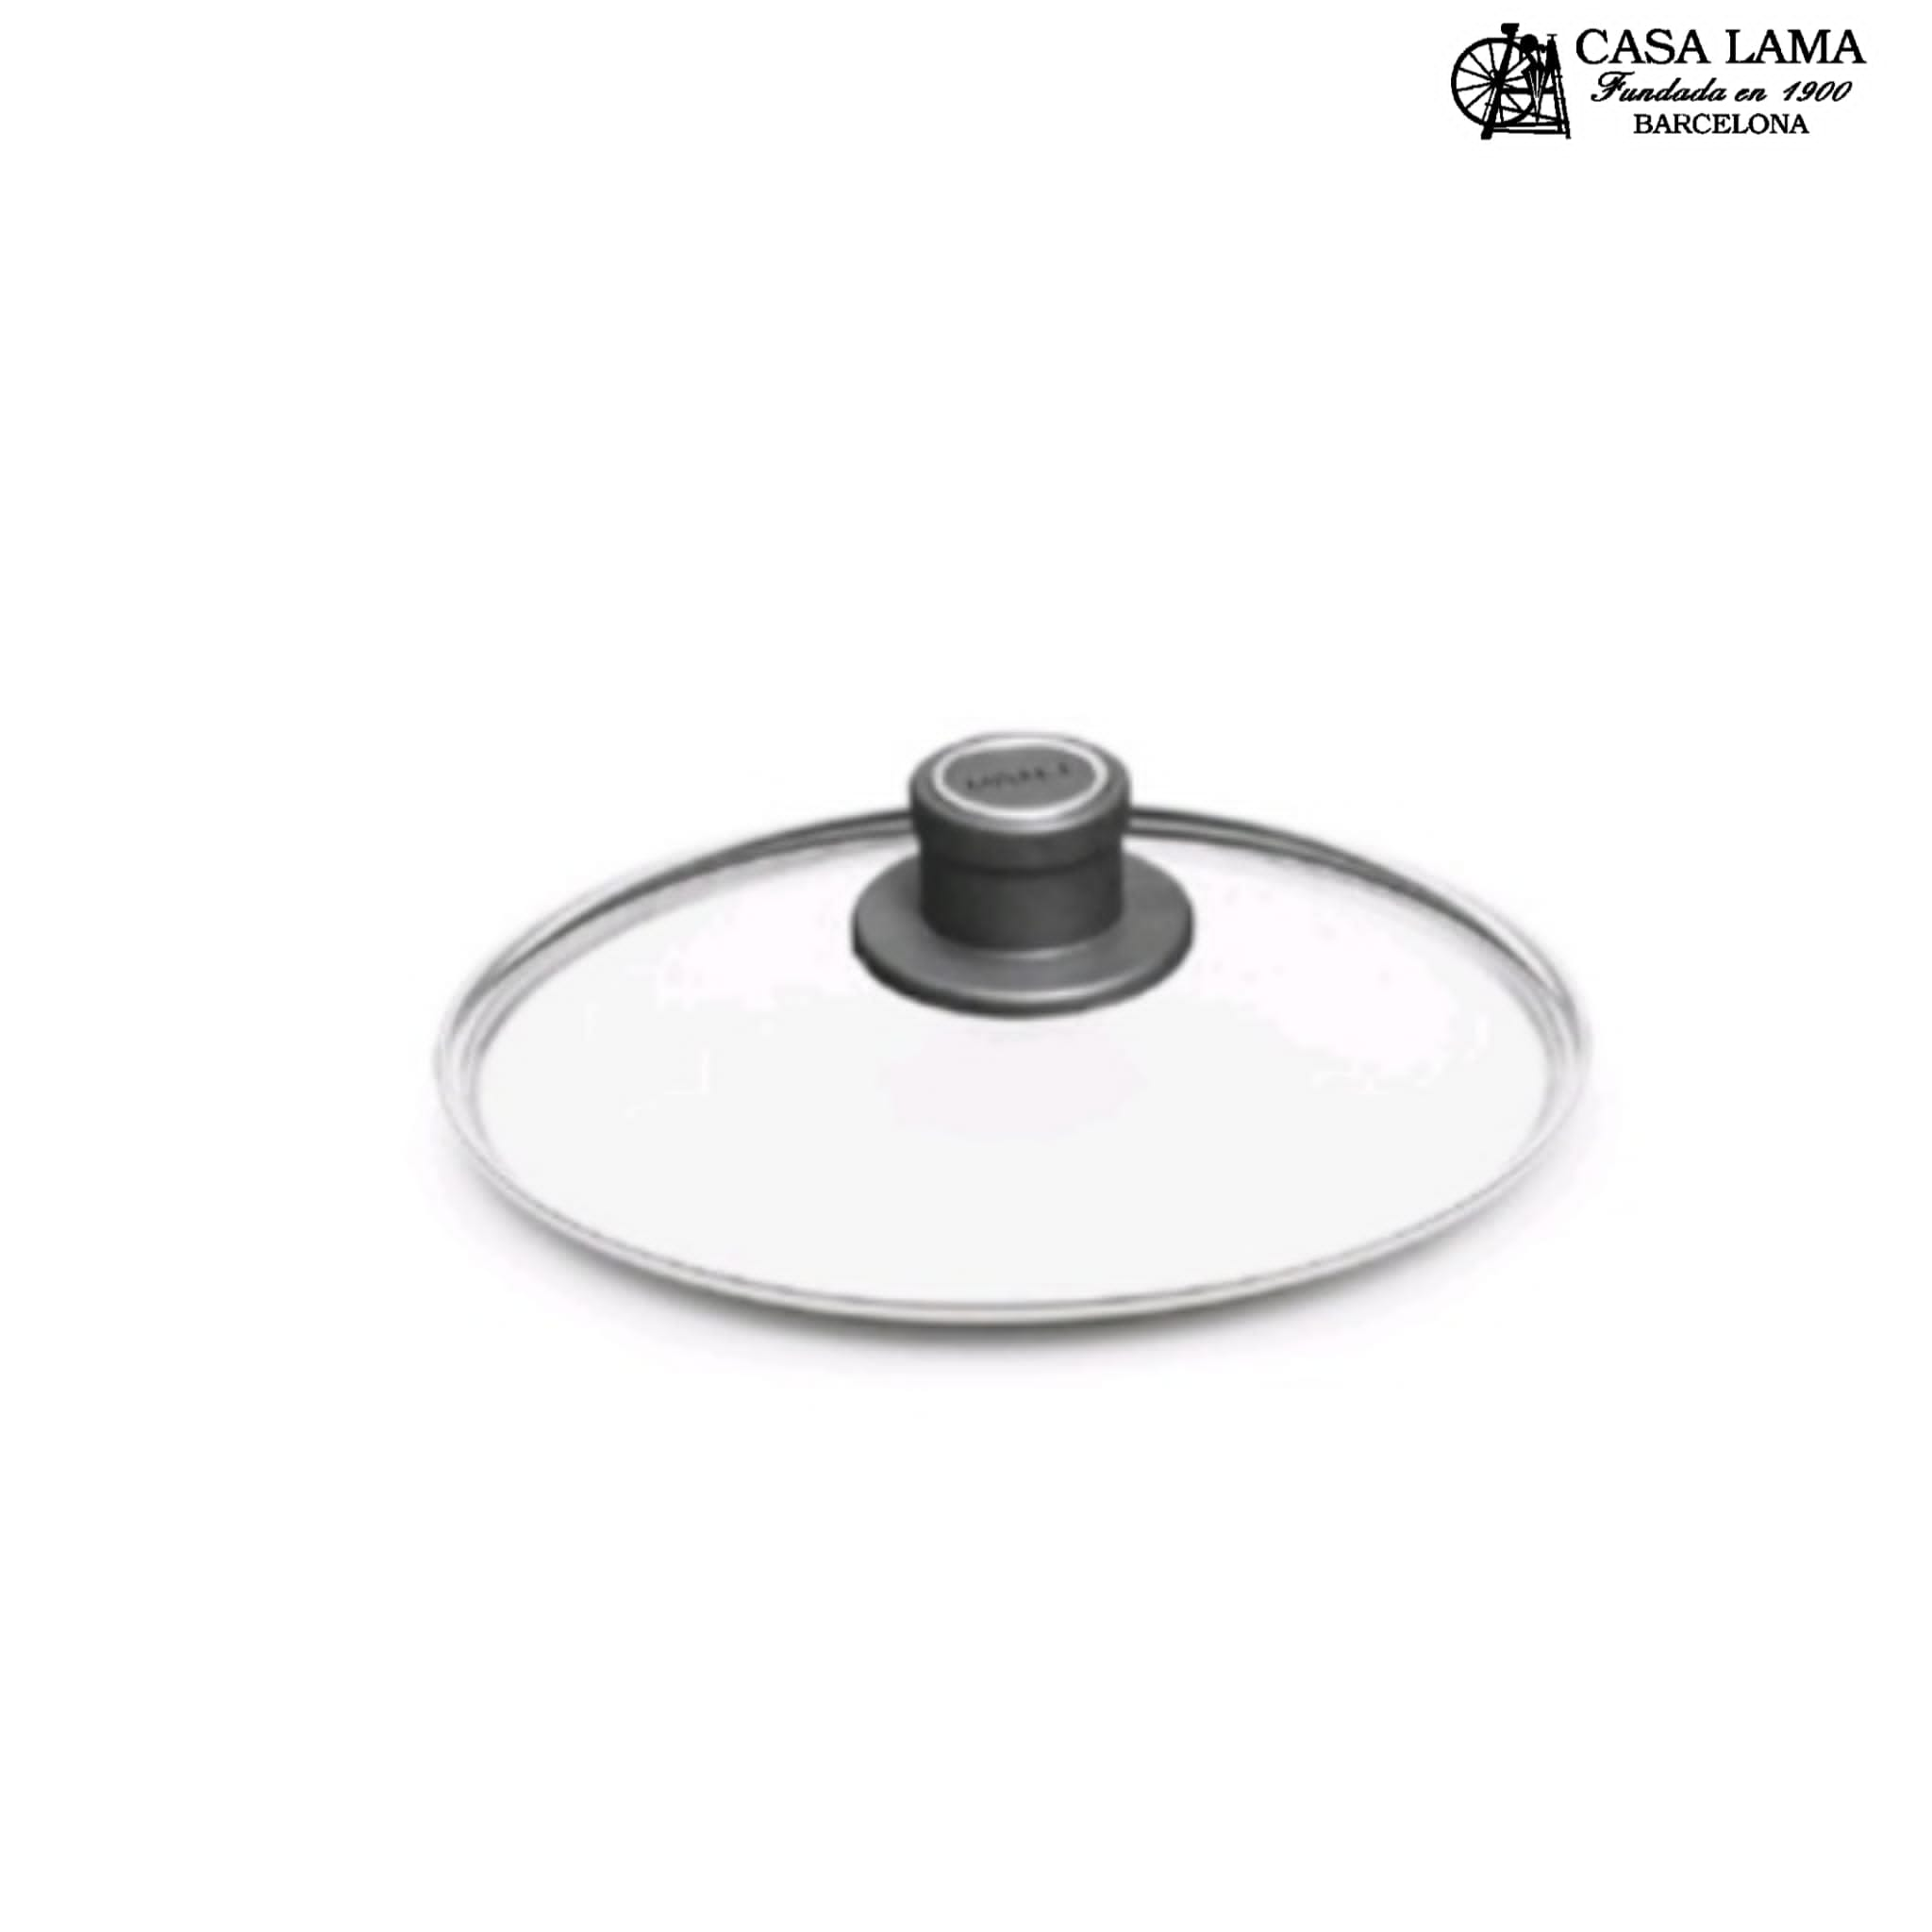 Tapa de cristal Woll para sartén, olla y cacerola de 18 a 32cm